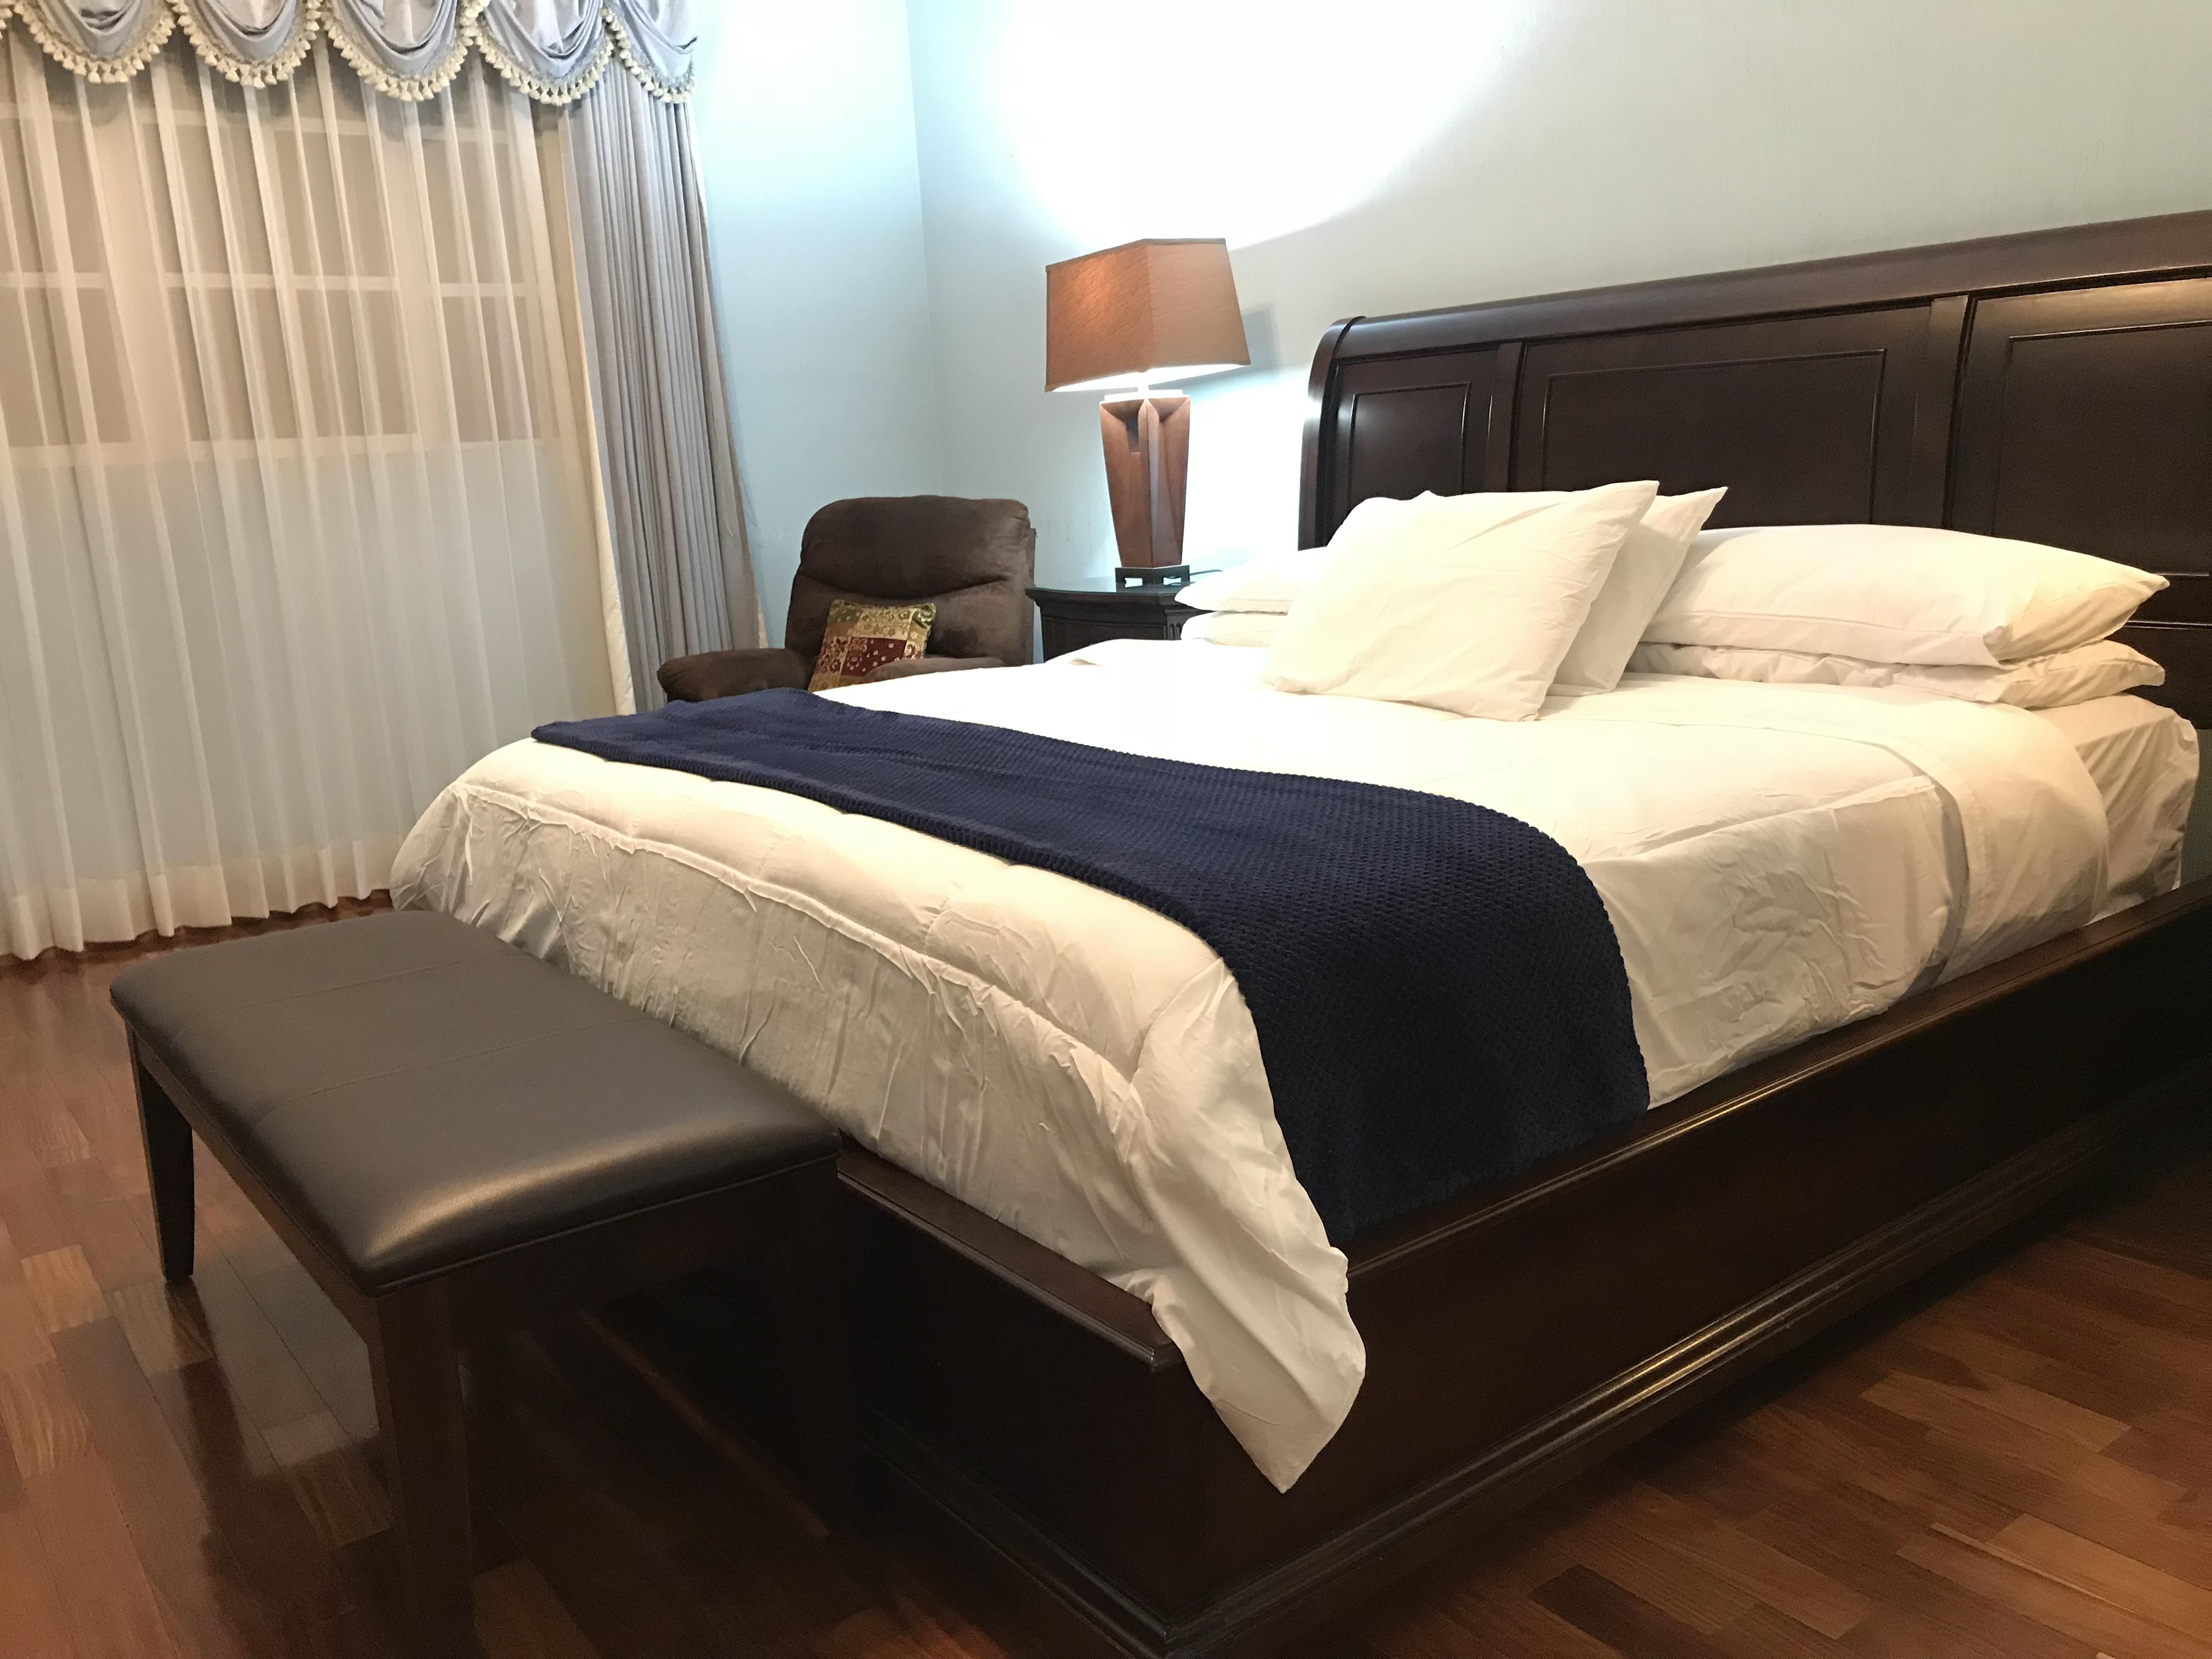 Principal ventana cama completa